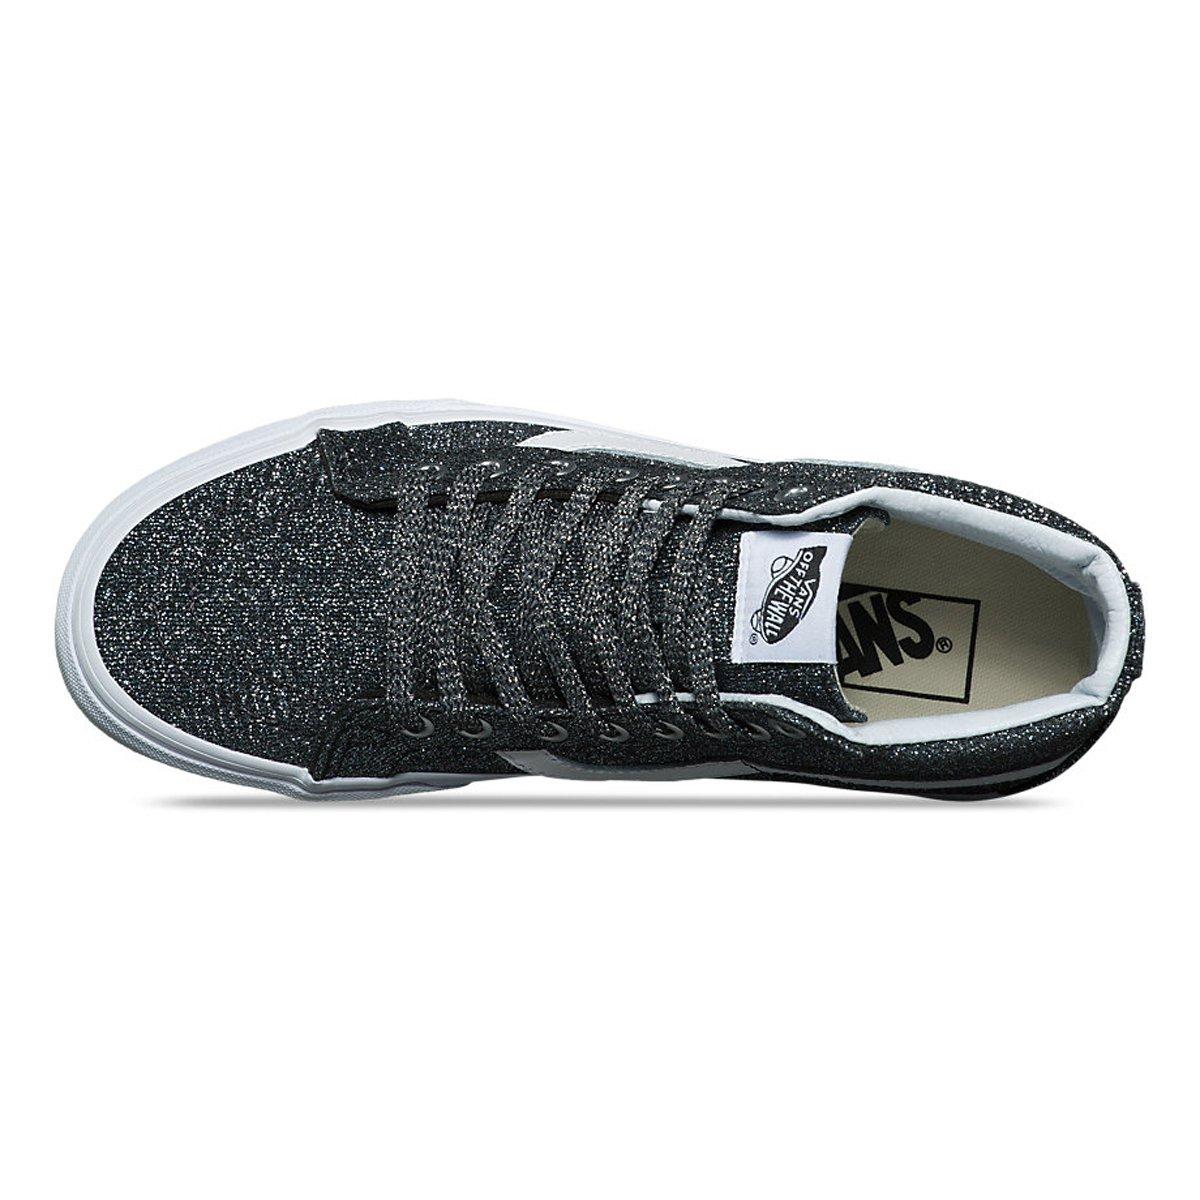 9321759ae7570 Vans Sk8-hi Reissue Women s Grey Glittered Sports Shoes VN0A2XSBU3T 41 EU   Amazon.co.uk  Shoes   Bags